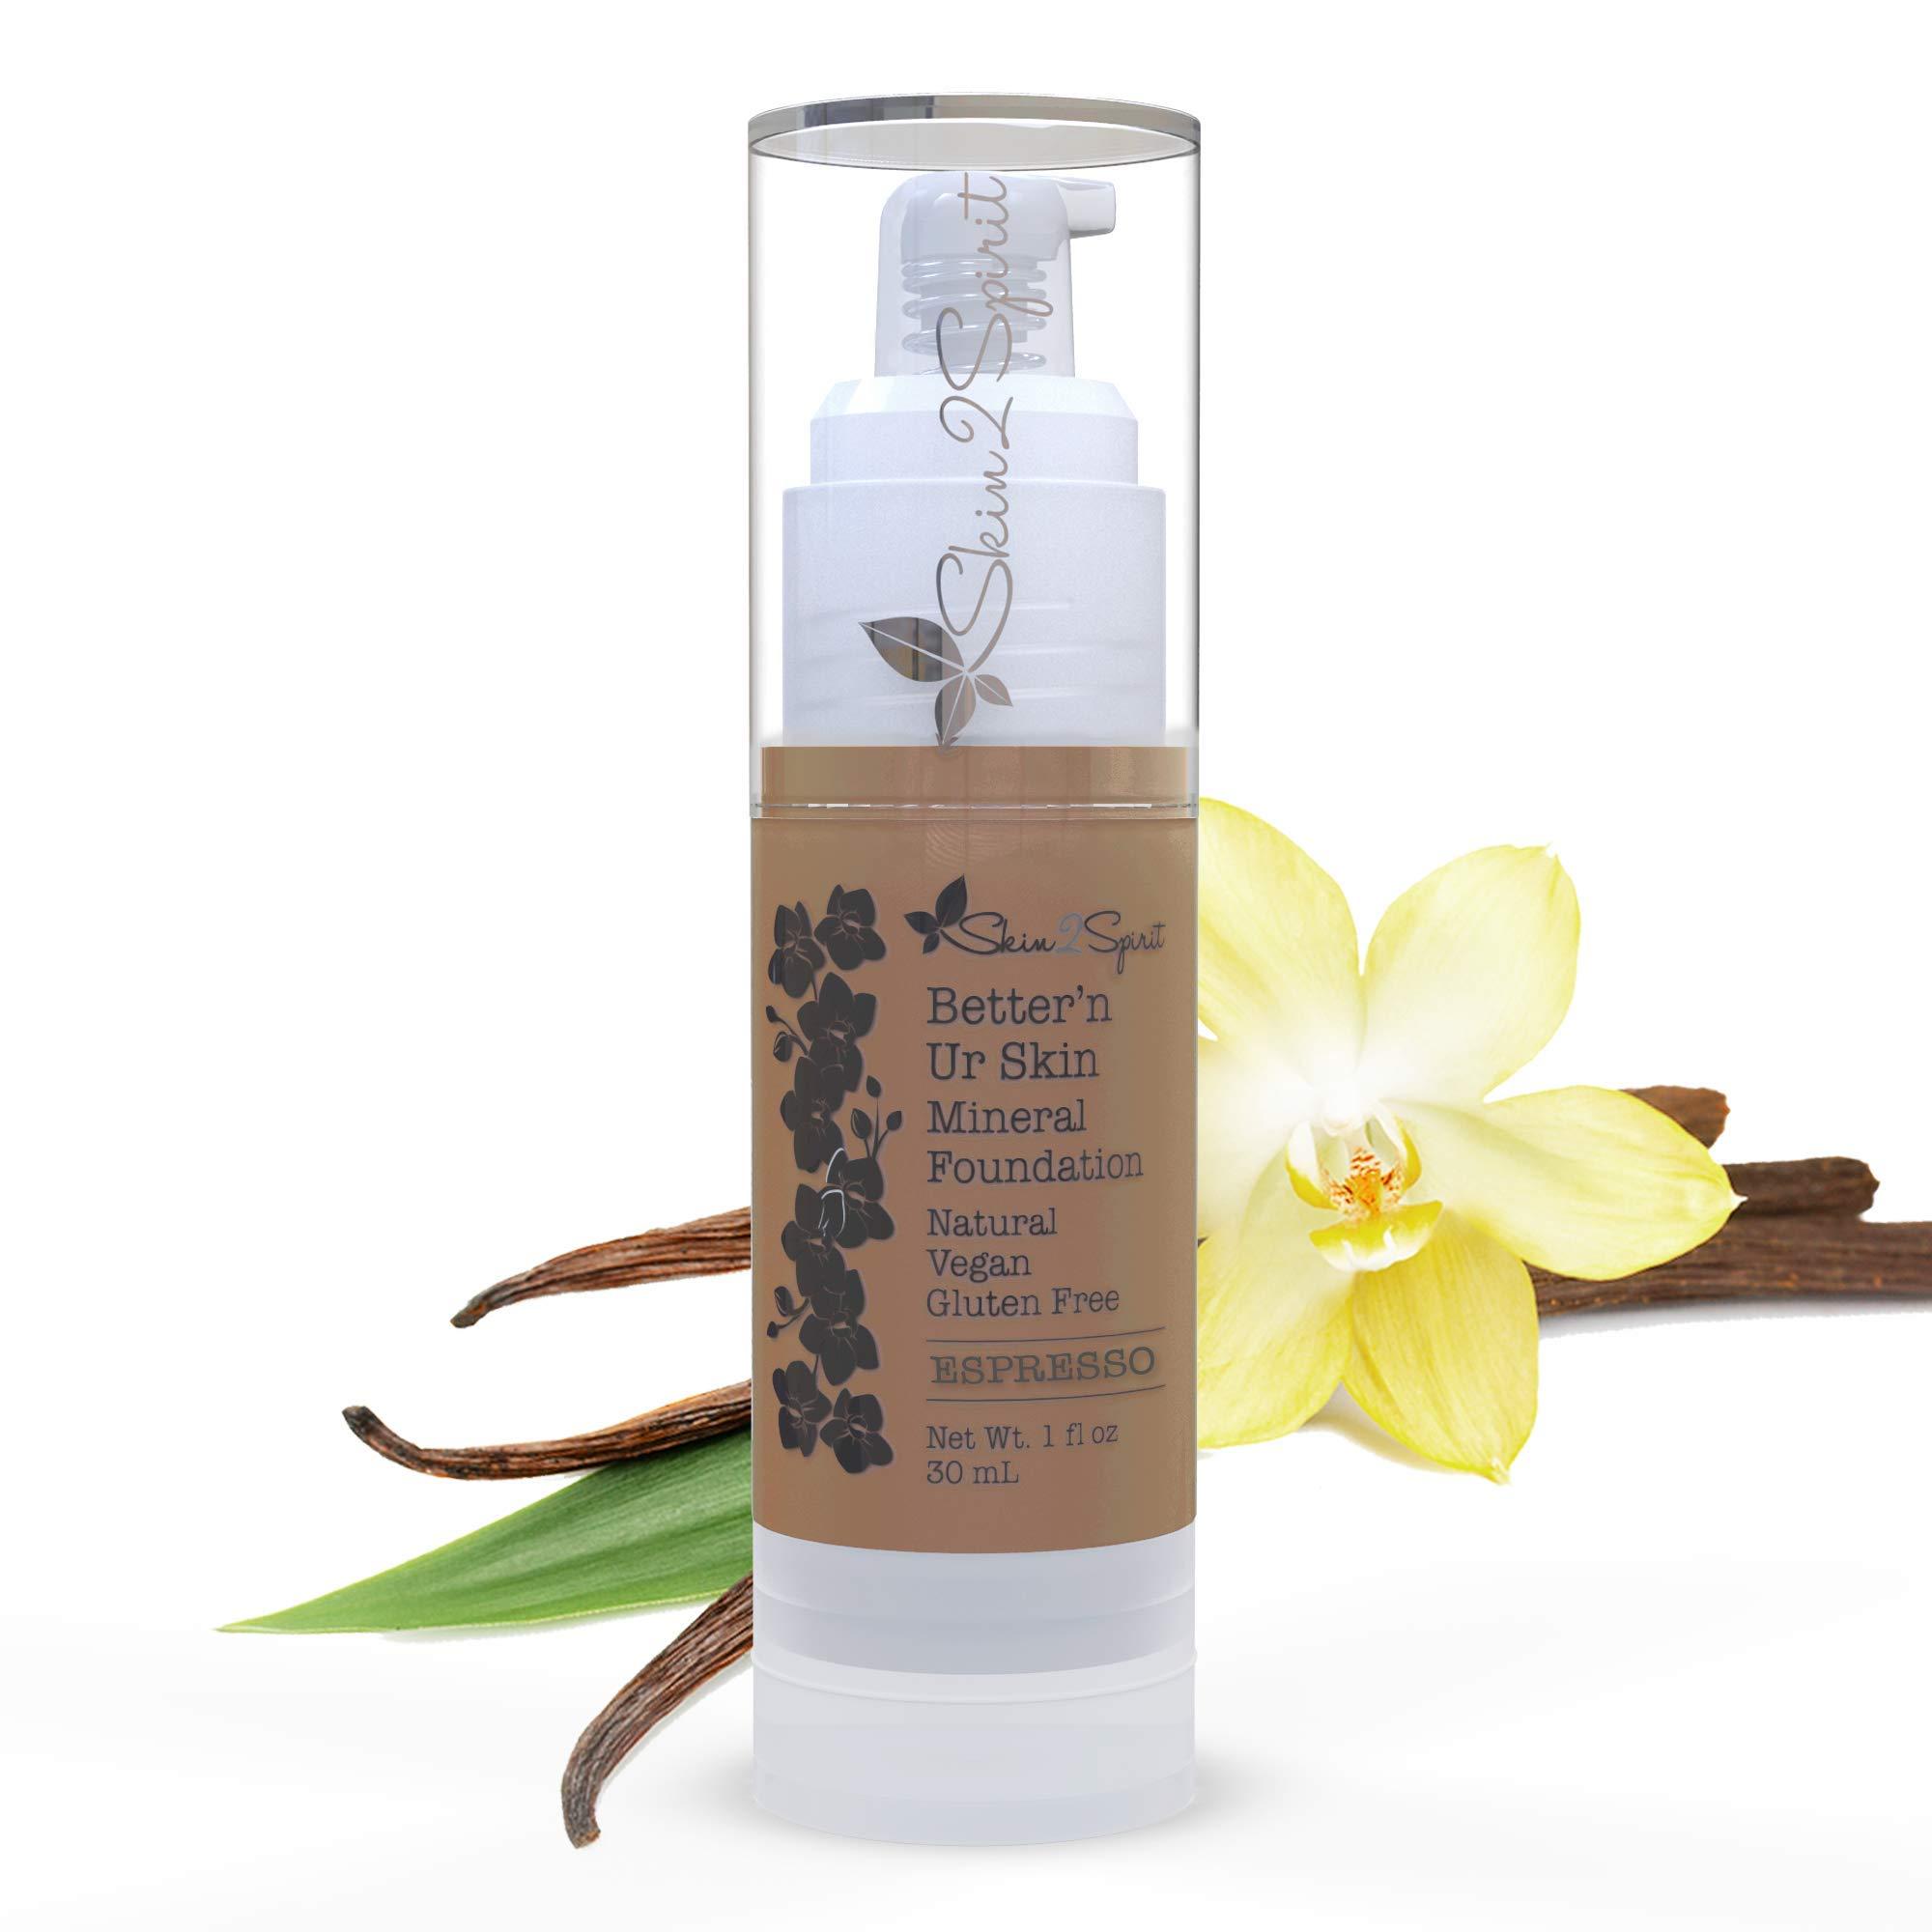 Better'n Ur Skin (ESPRESSO: Rich Brown, Cool) Organic Liquid Foundation | Healthy, Buildable Coverage | All Natural | Vegan | Cruelty Free | Gluten Free | Non GMO | Palm Free | Natural Sun Protection